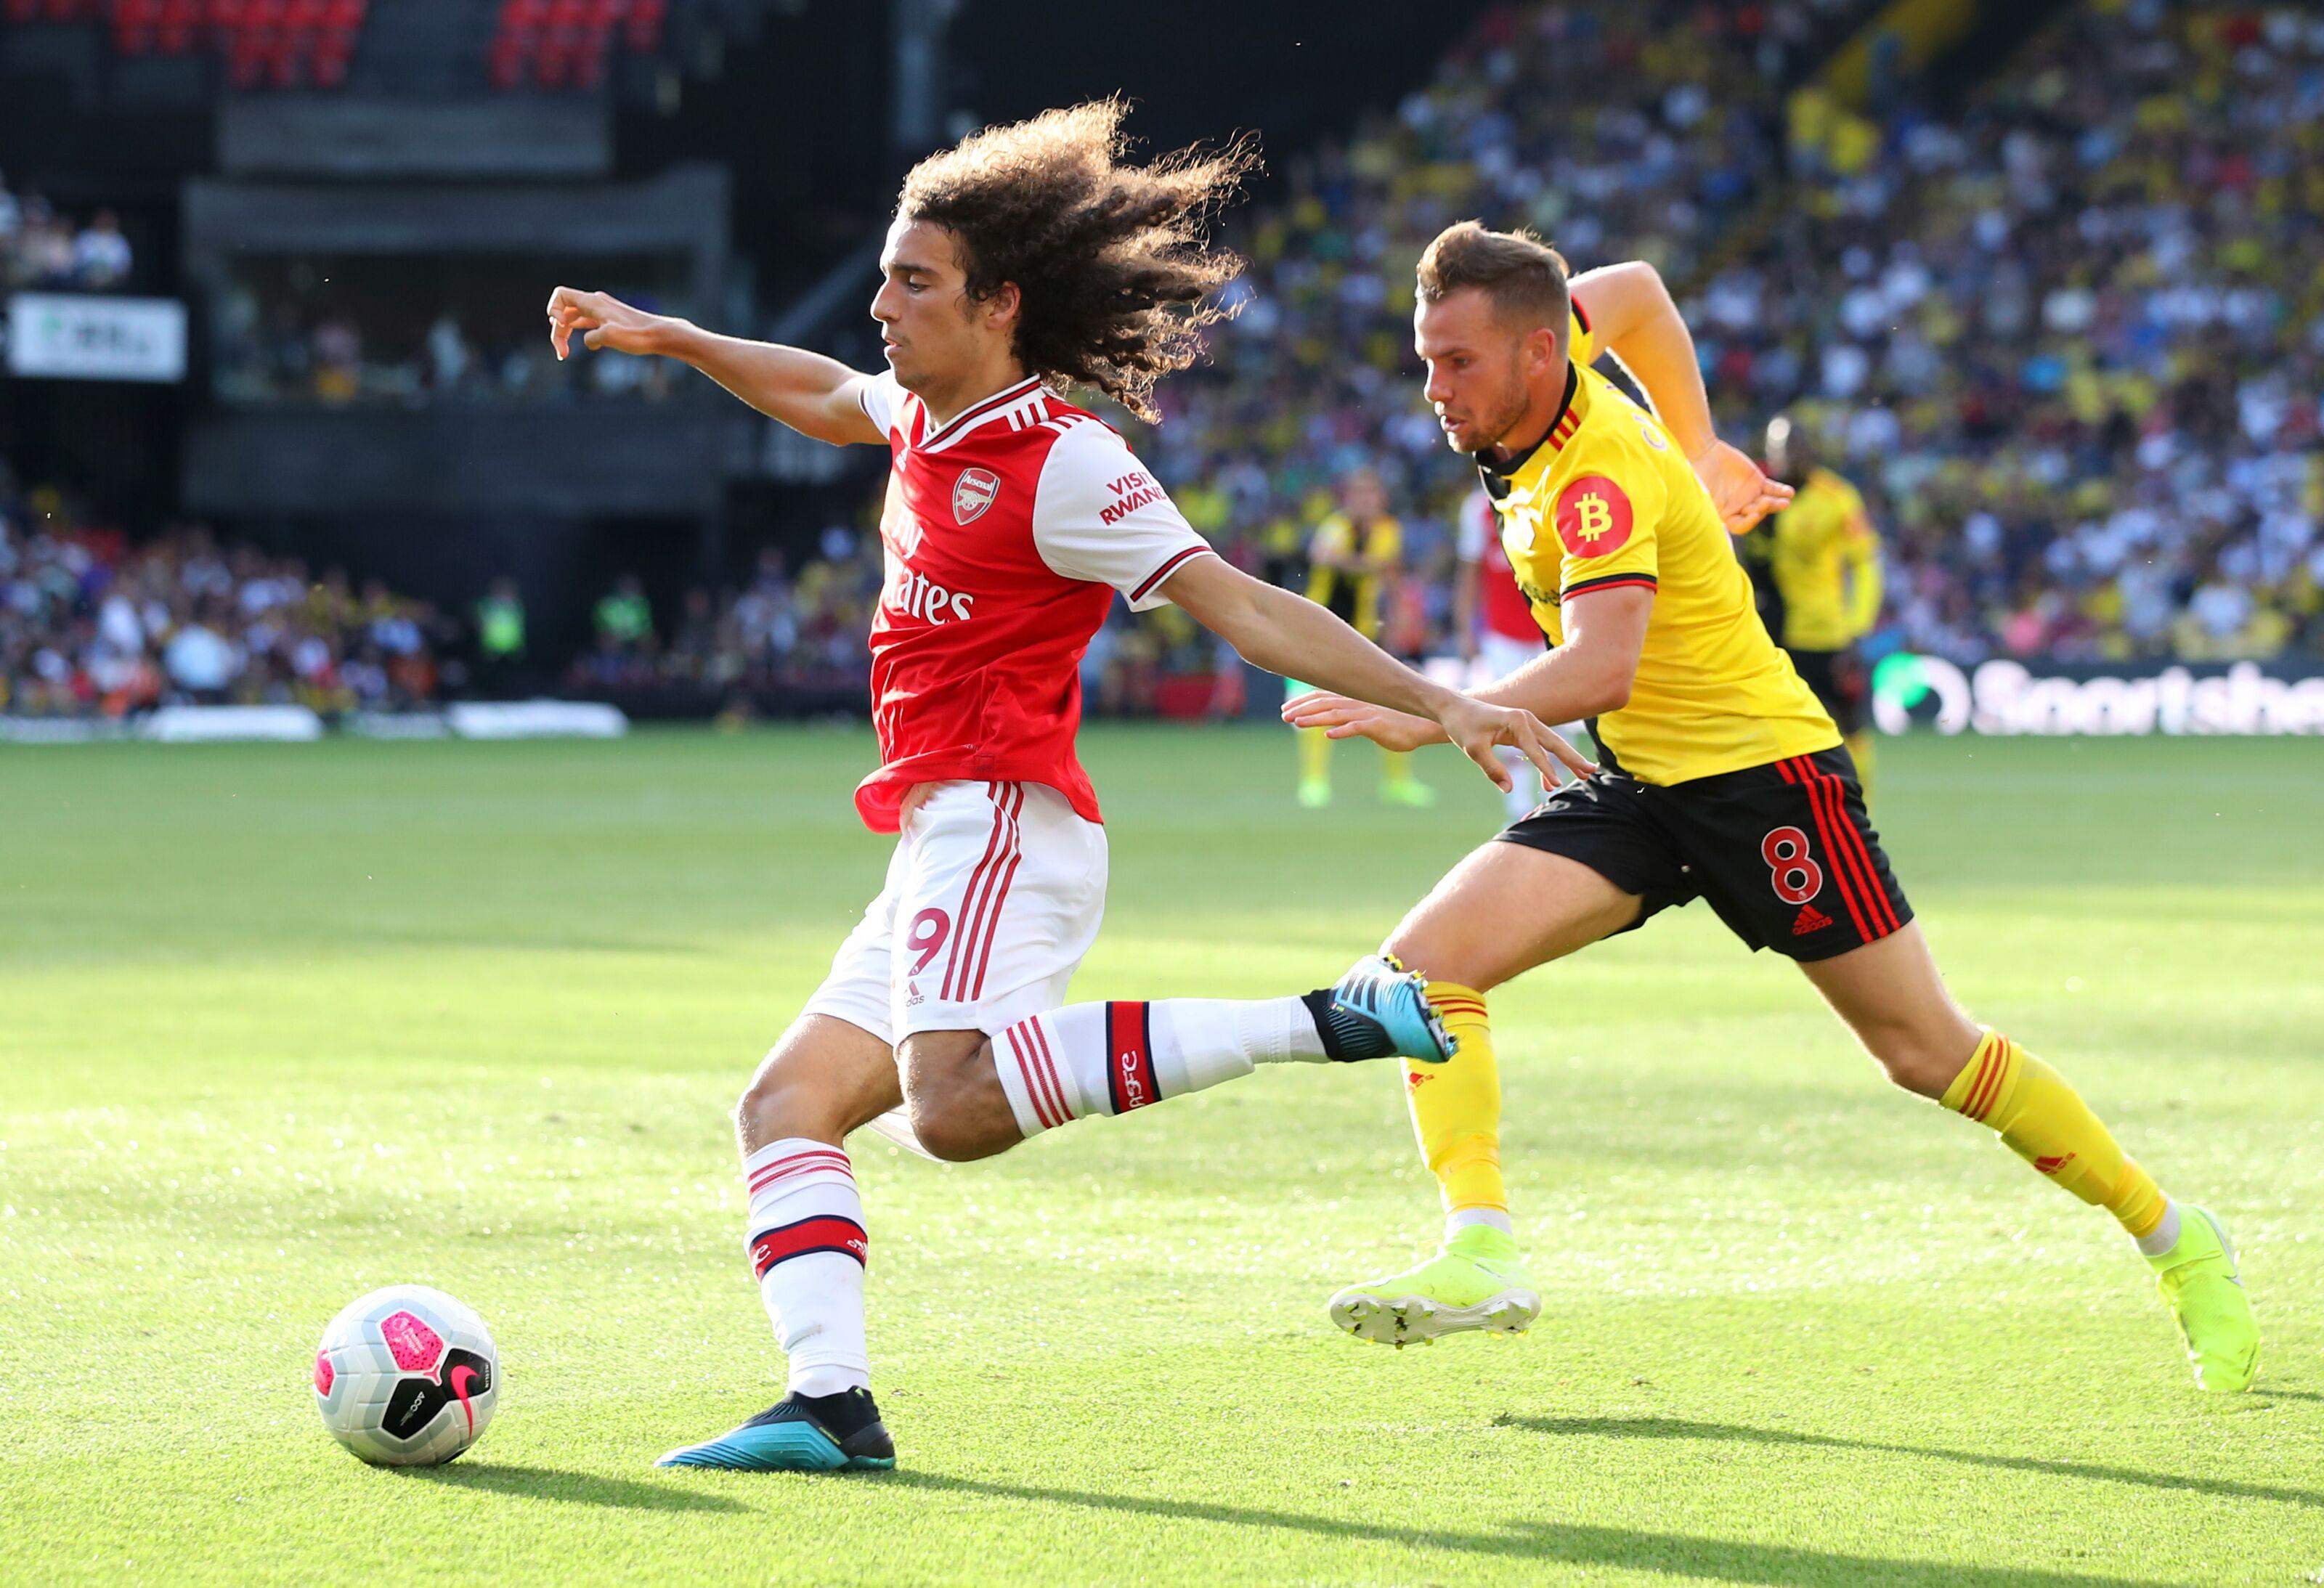 Arsenal: The Watford meltdown and its optics